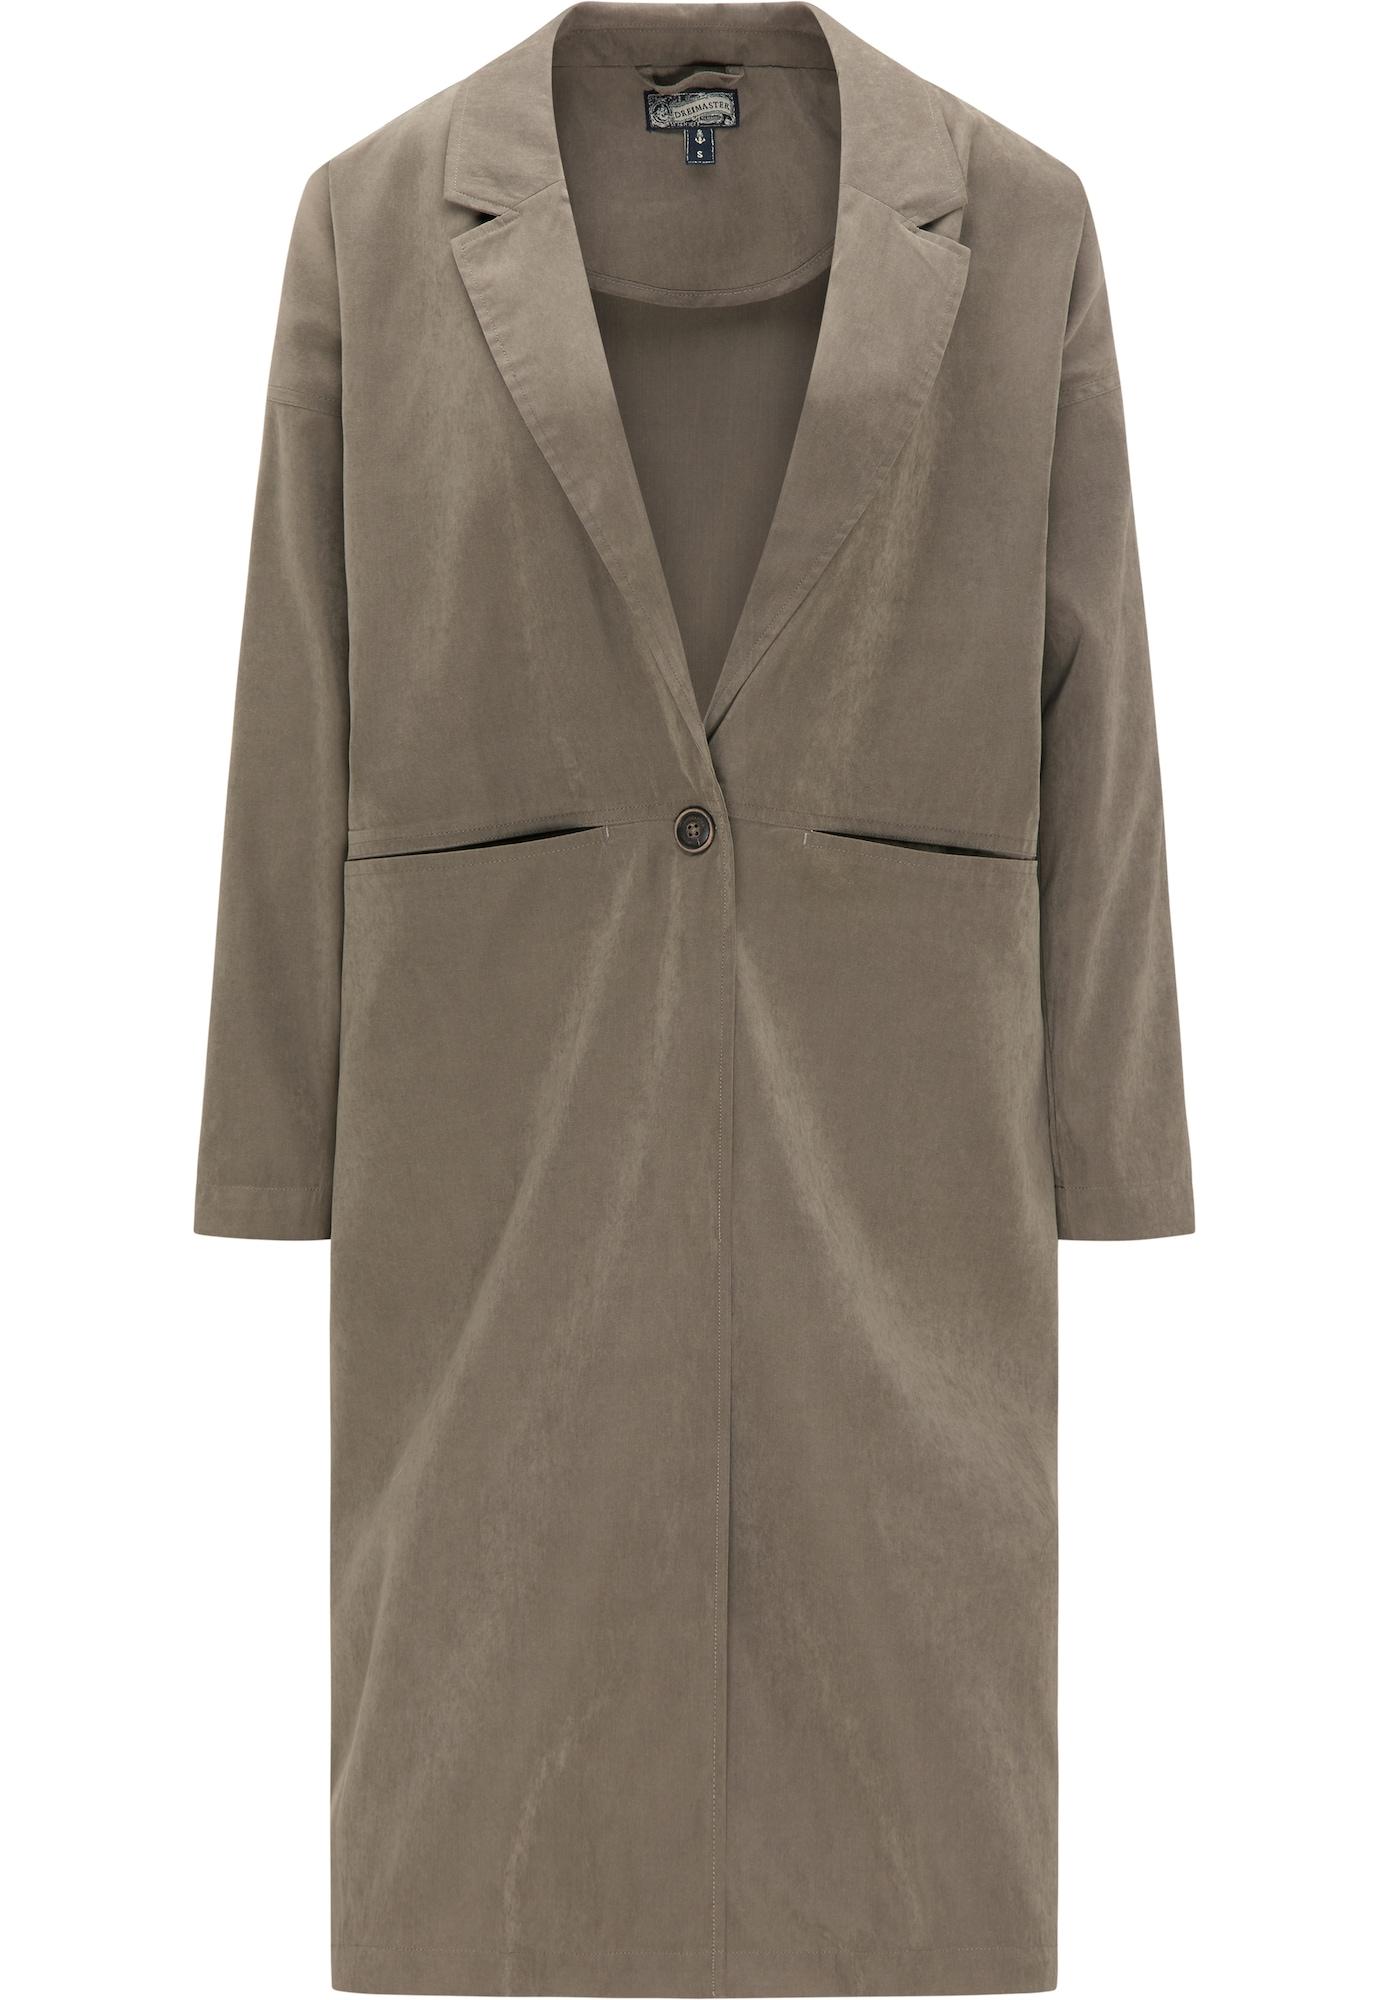 DreiMaster Vintage Vasarinis paltas rusvai pilka